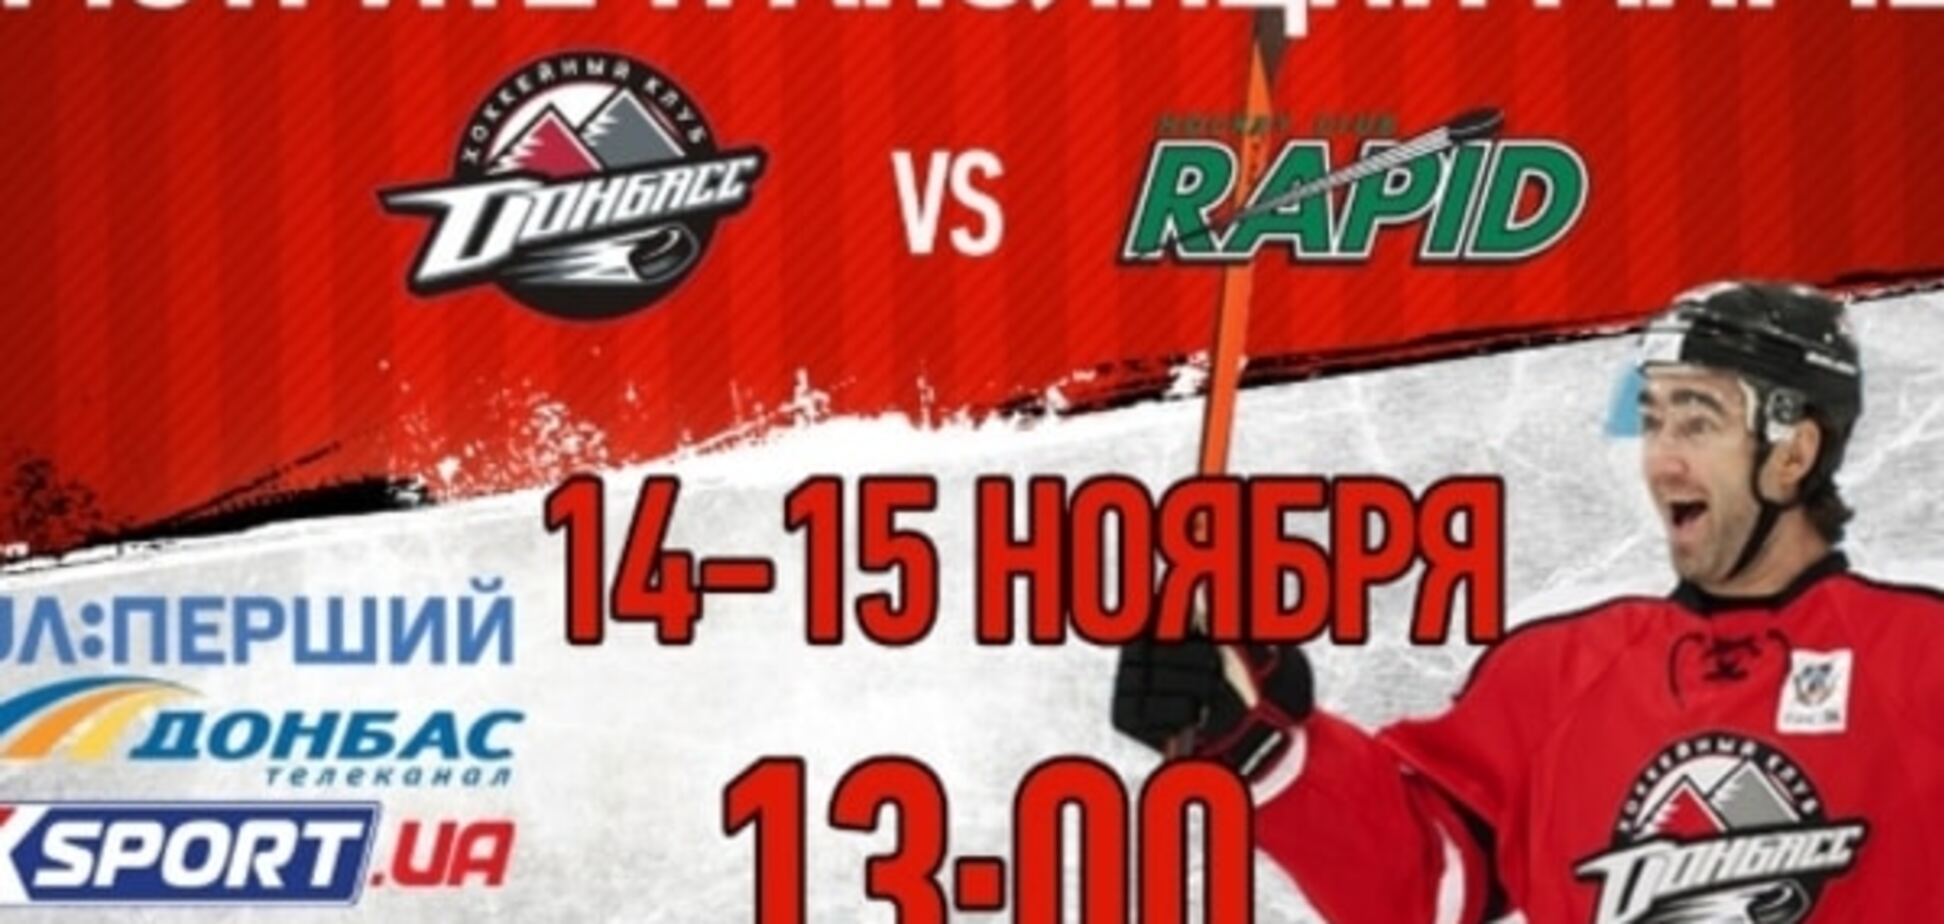 ХК Донбасс - Рапид - 20-0: уверенная победа